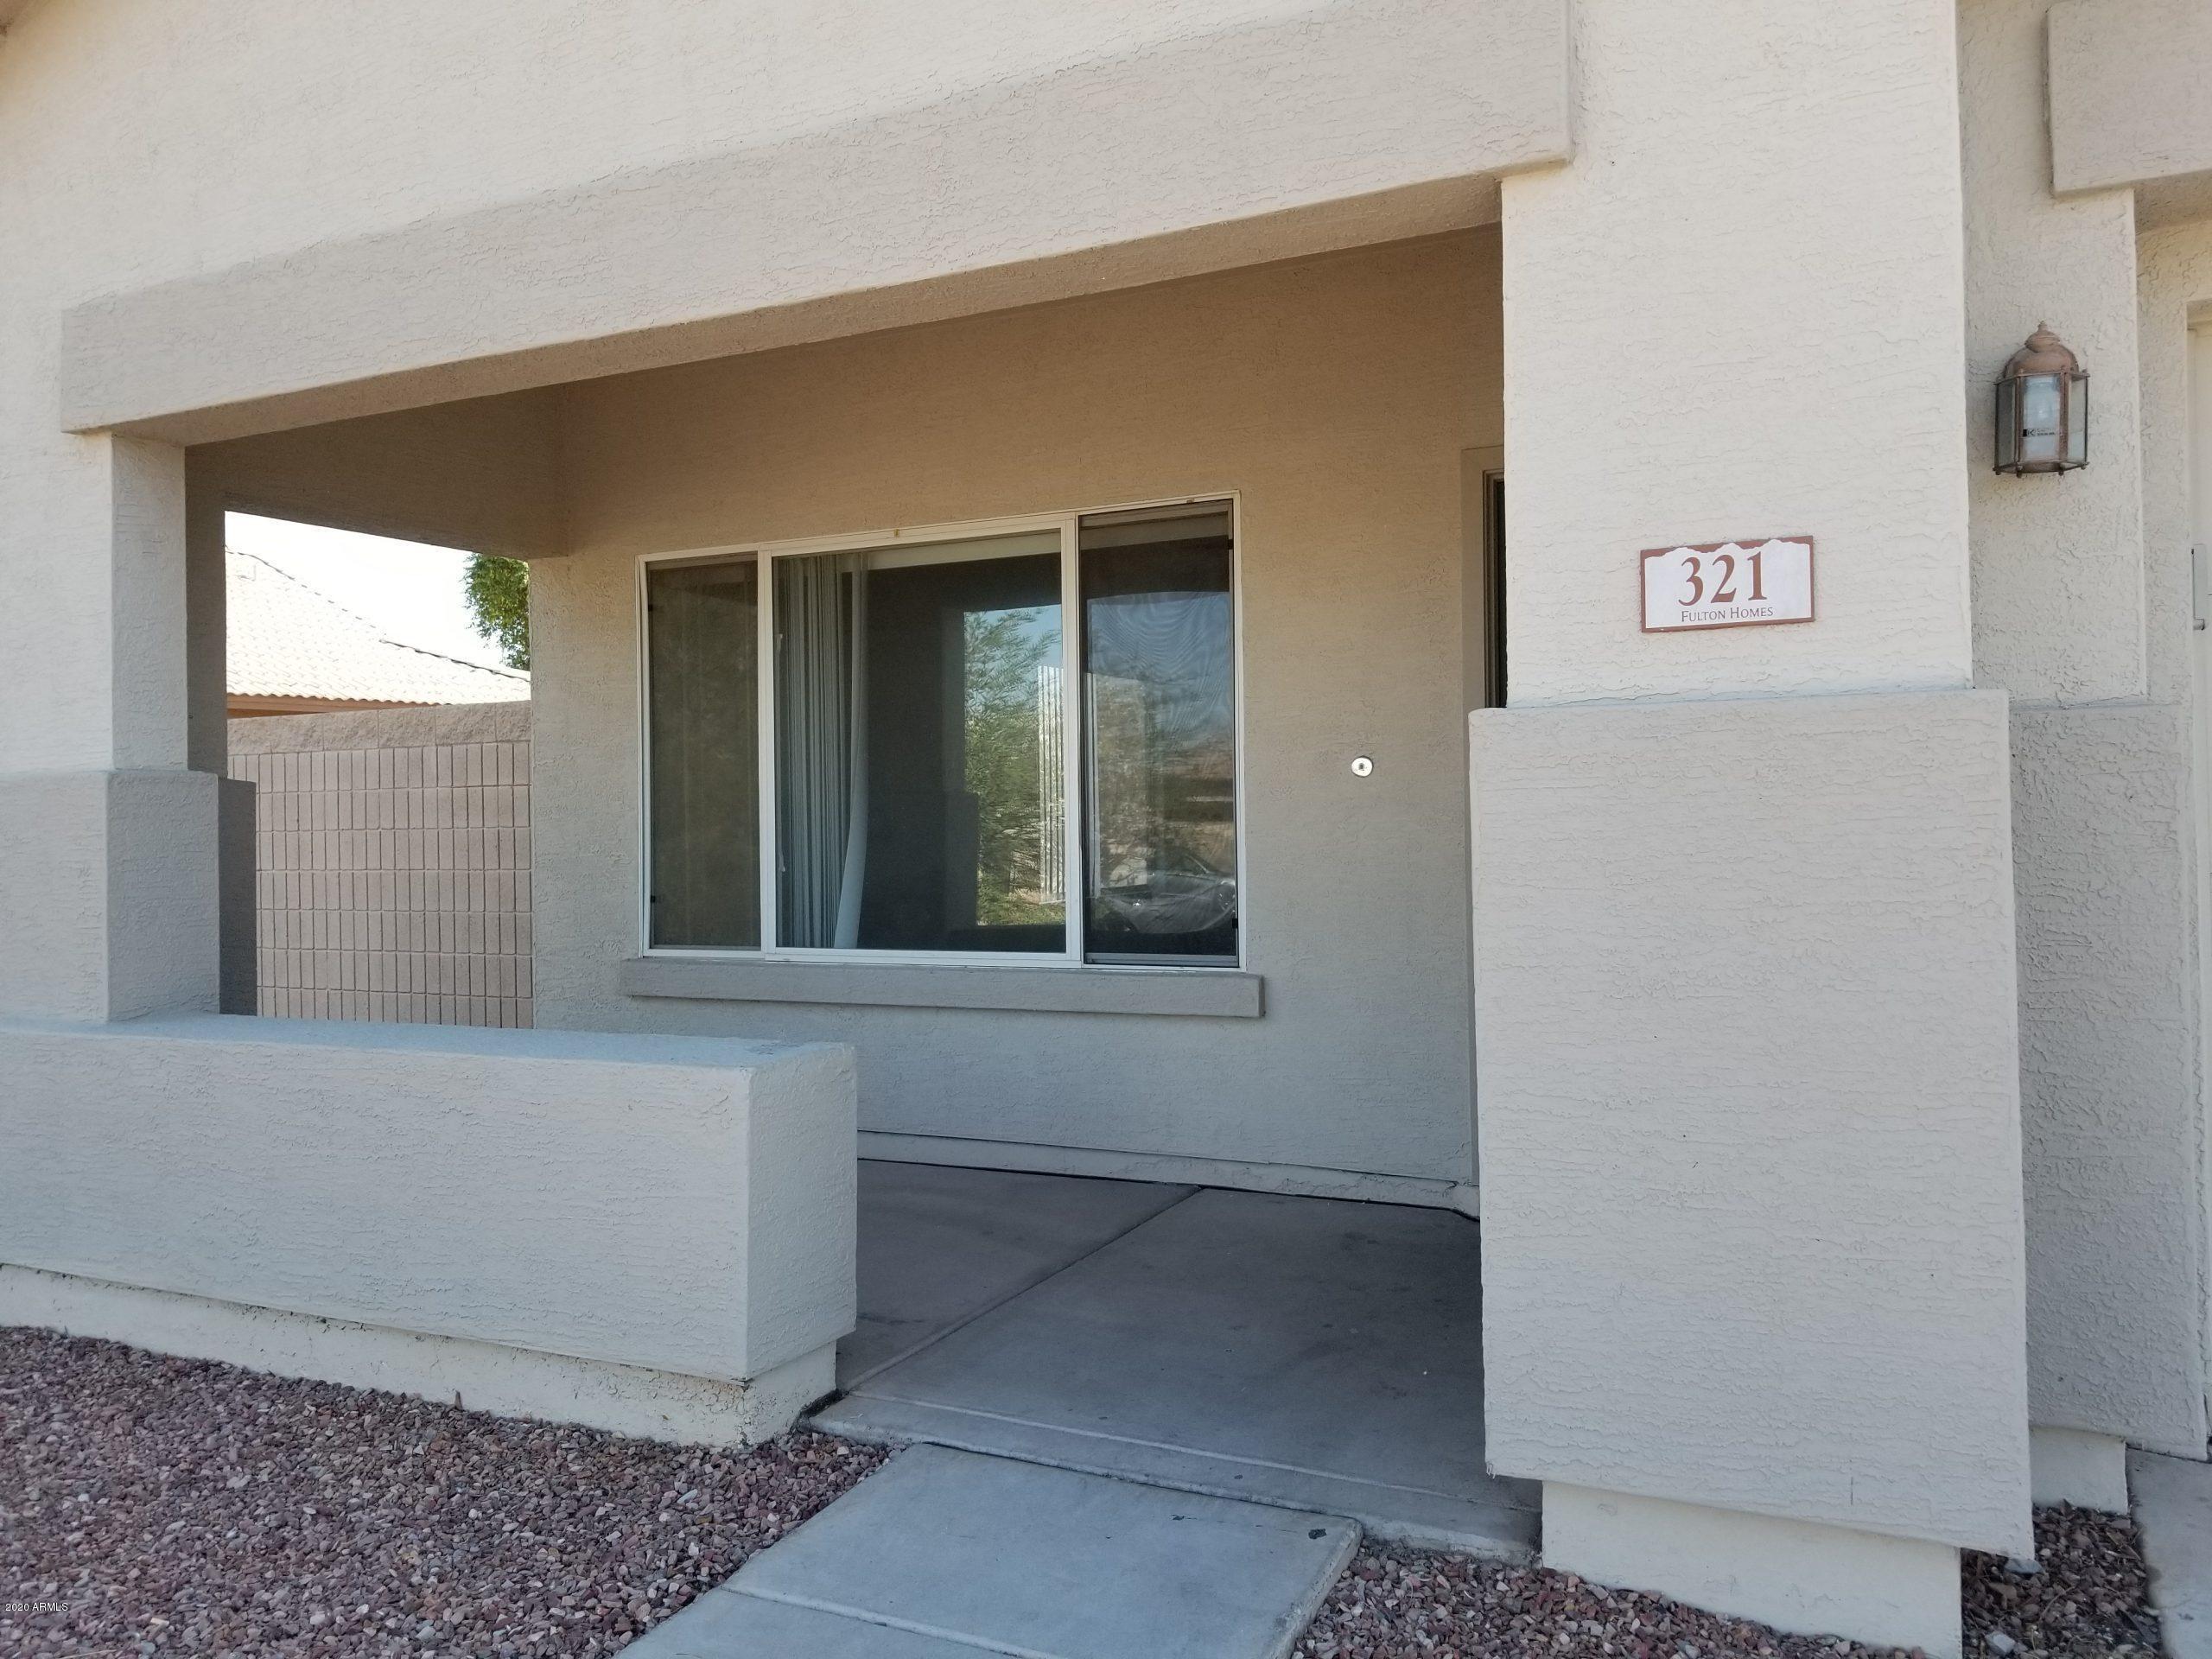 MLS 6147200 321 S 120TH Avenue, Avondale, AZ 85323 Avondale AZ Golf